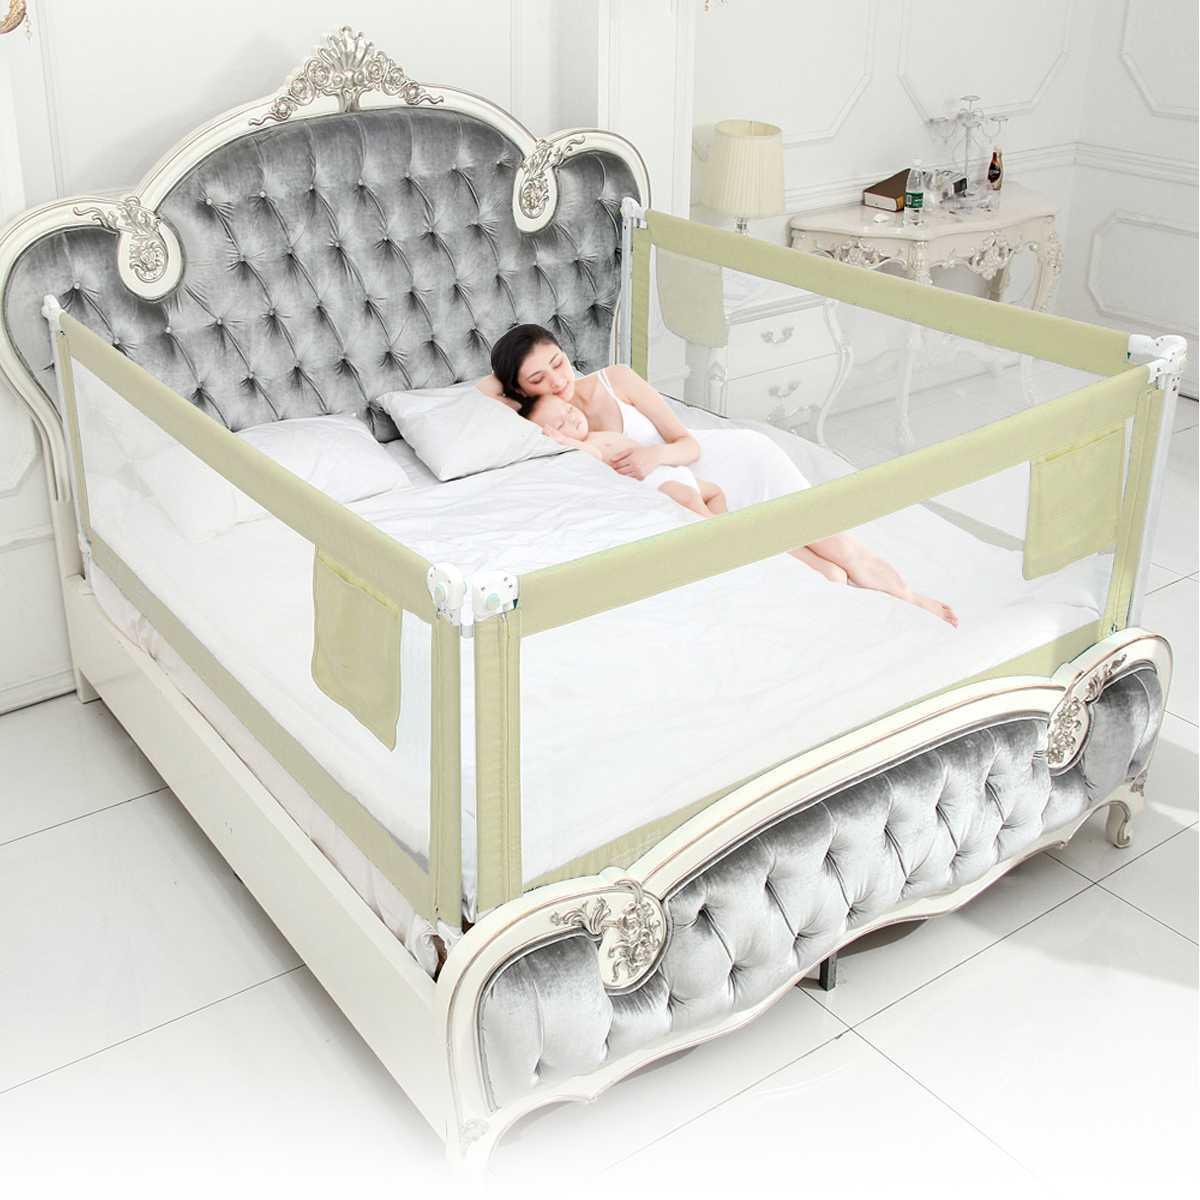 CE Certification 1.5-2m Newborn Baby Safety Fence Guard Adjustable Bed Rail Infant Bed Pocket Playpen Kids Bed Guardrail Rail